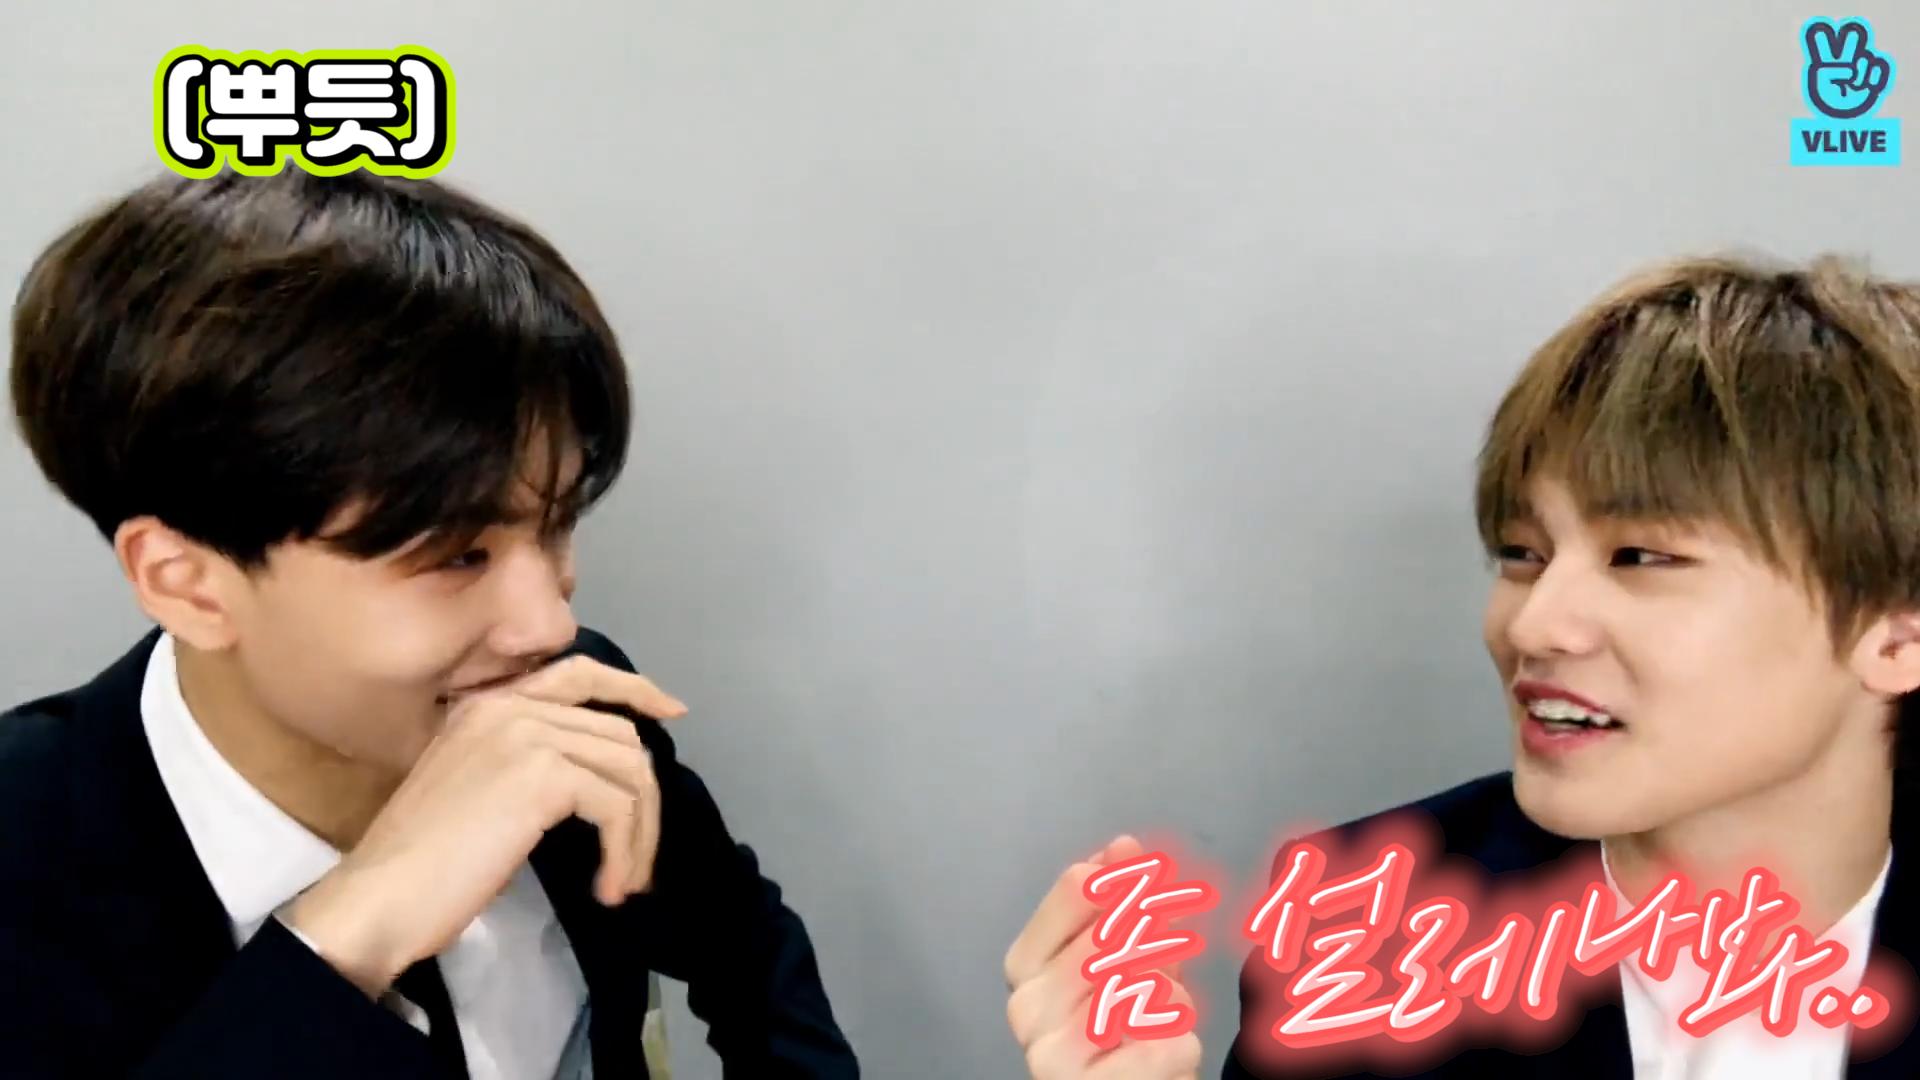 [NCT] 오늘도 수고했어요! 천지테라피 하는 지금만큼은 편히 쉬세요💚 (Chenle&Jisung talking about abs)